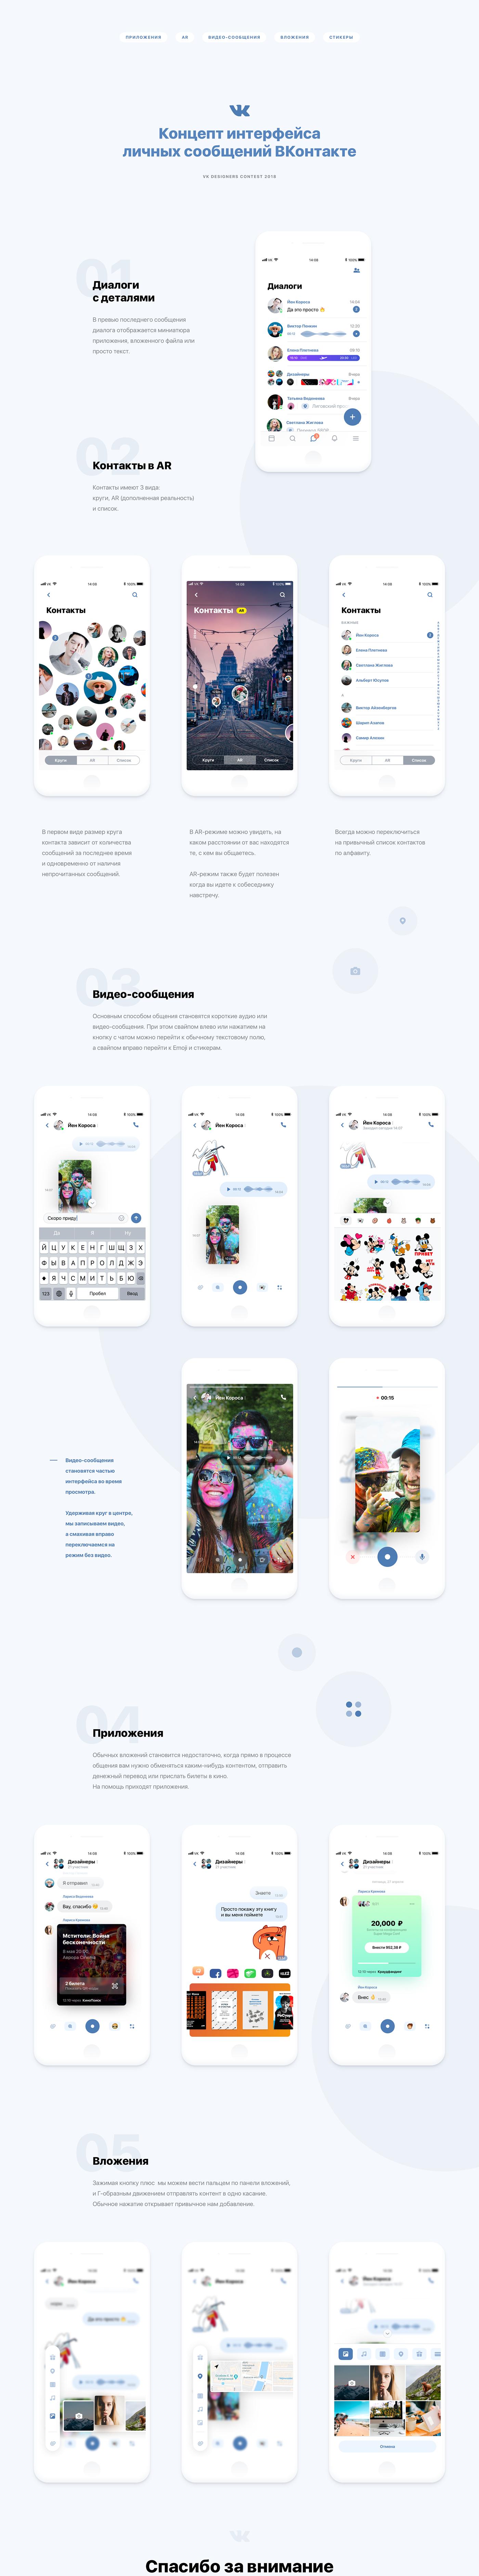 VK,vkontakte,messenger,app,UI,ios,Chat,message,Interface,AR